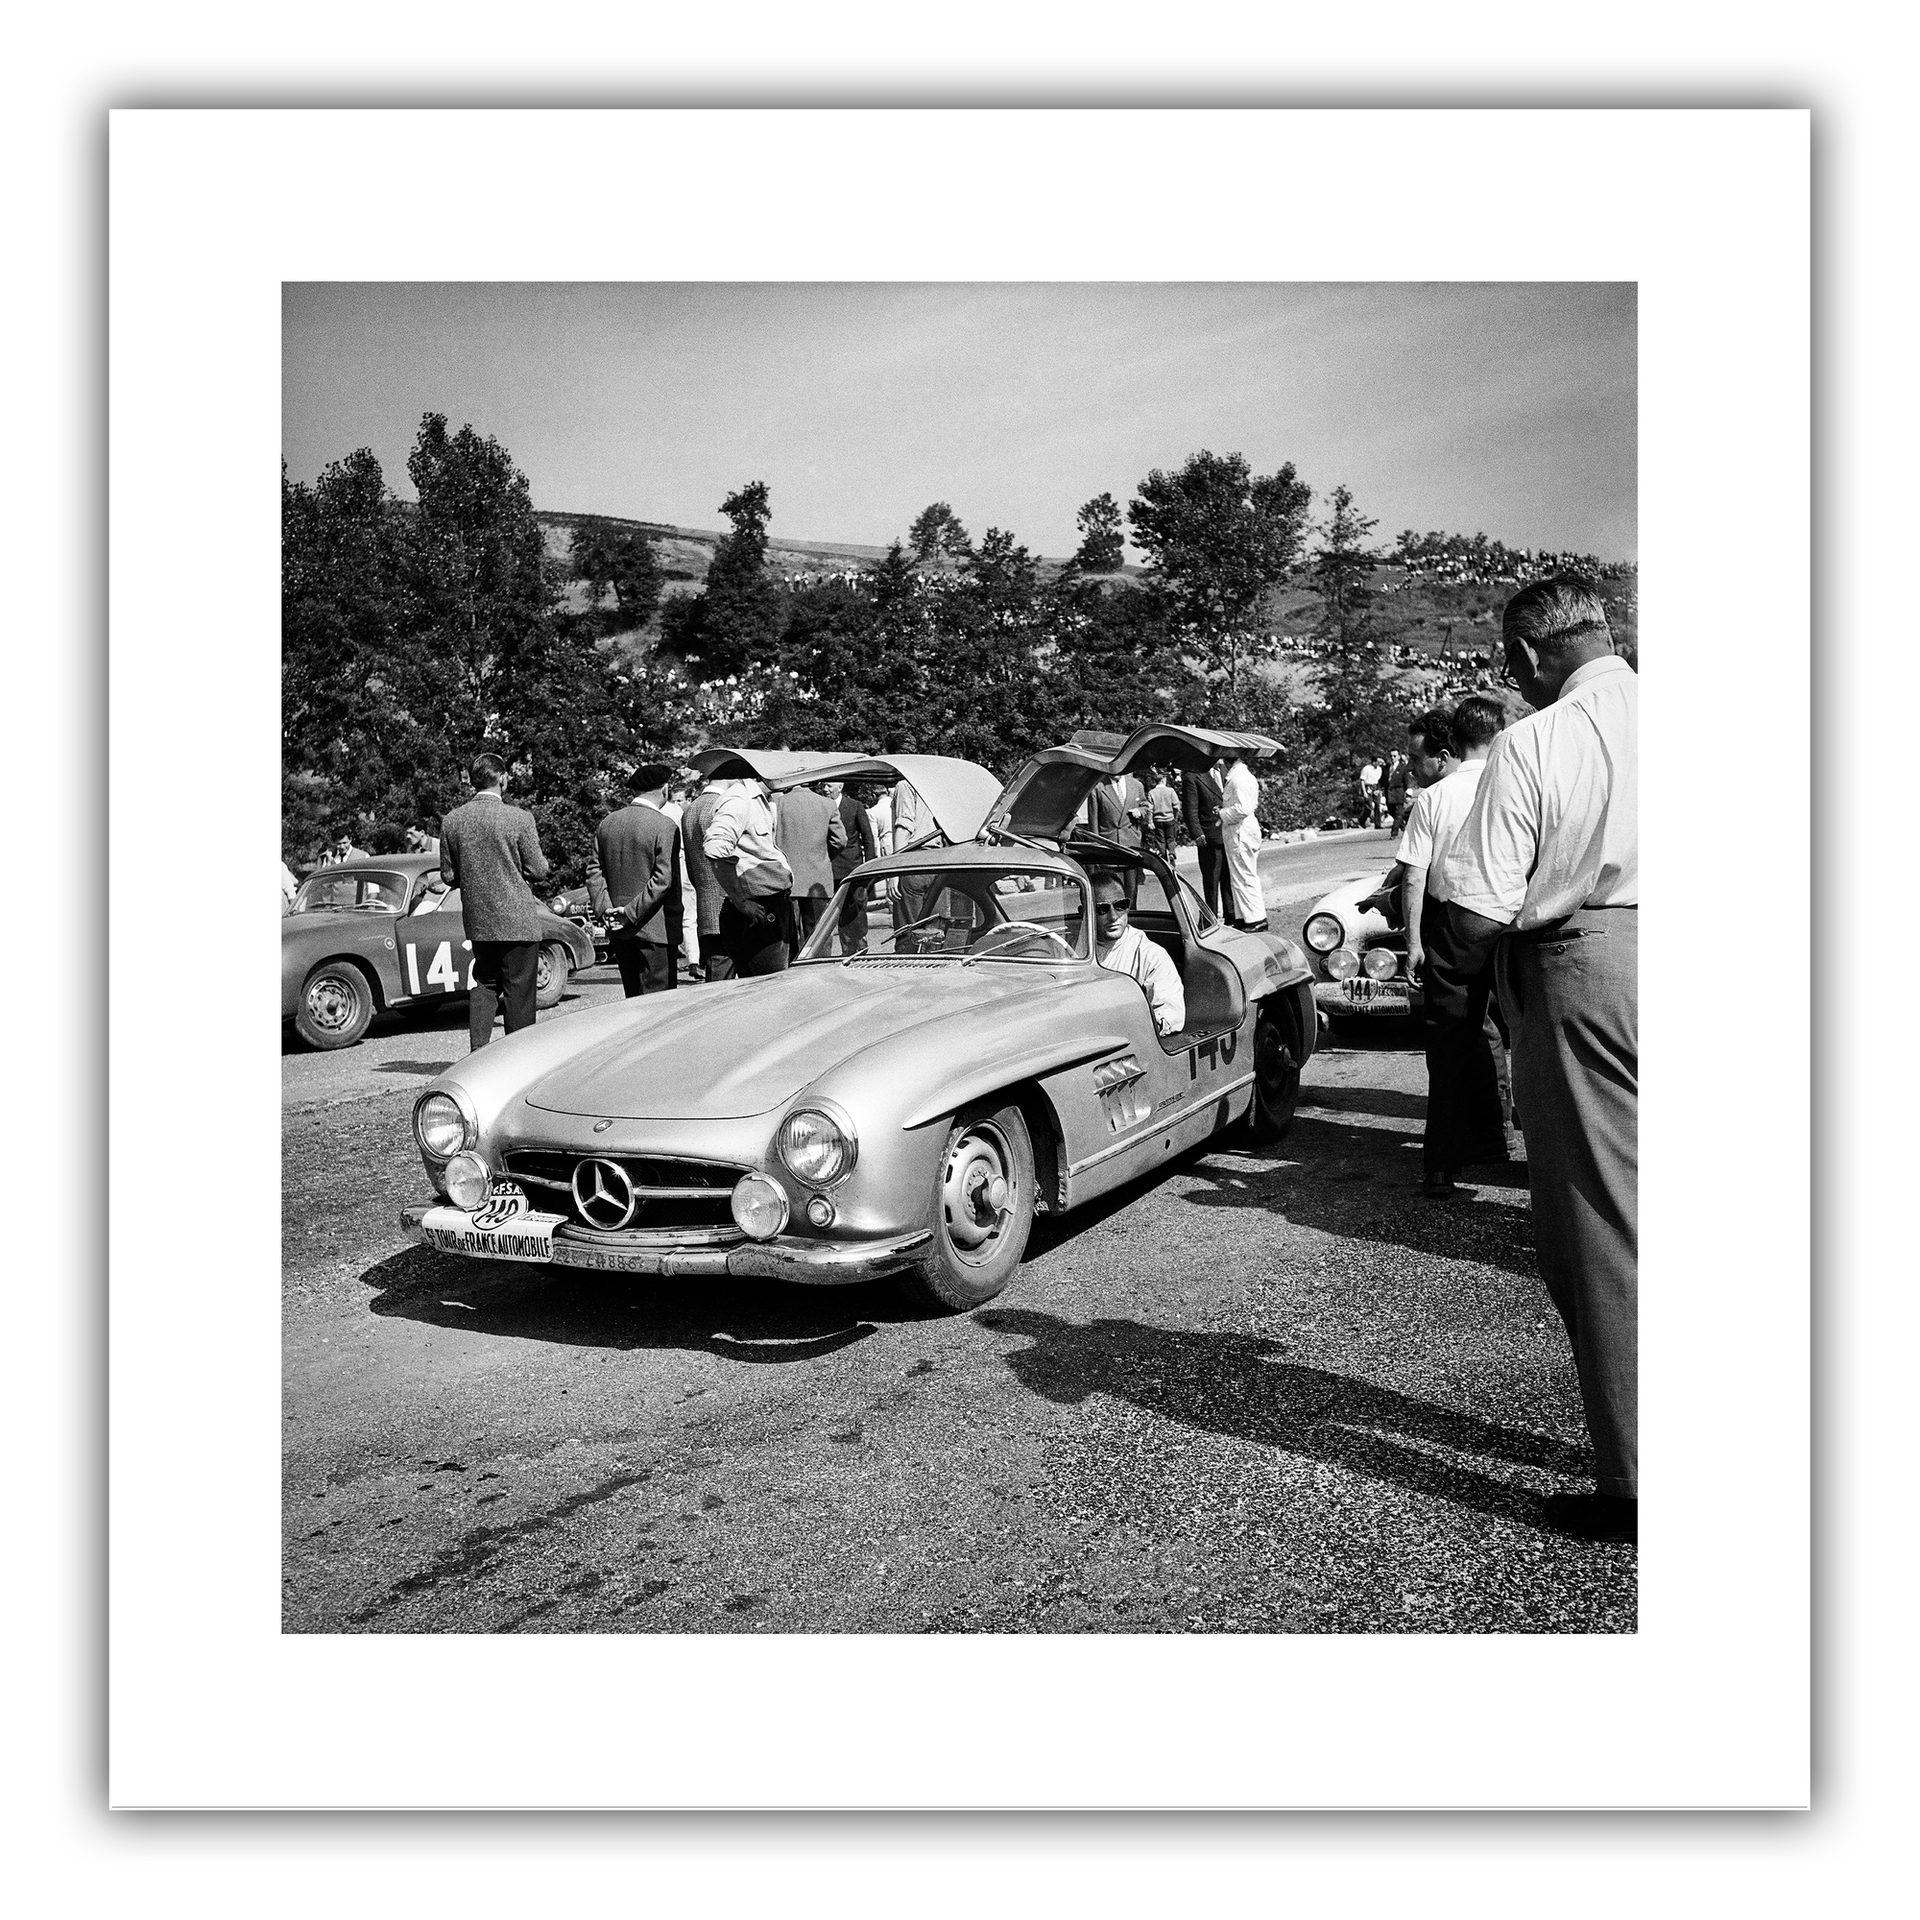 Gullwing Racing - Tour de France 1956